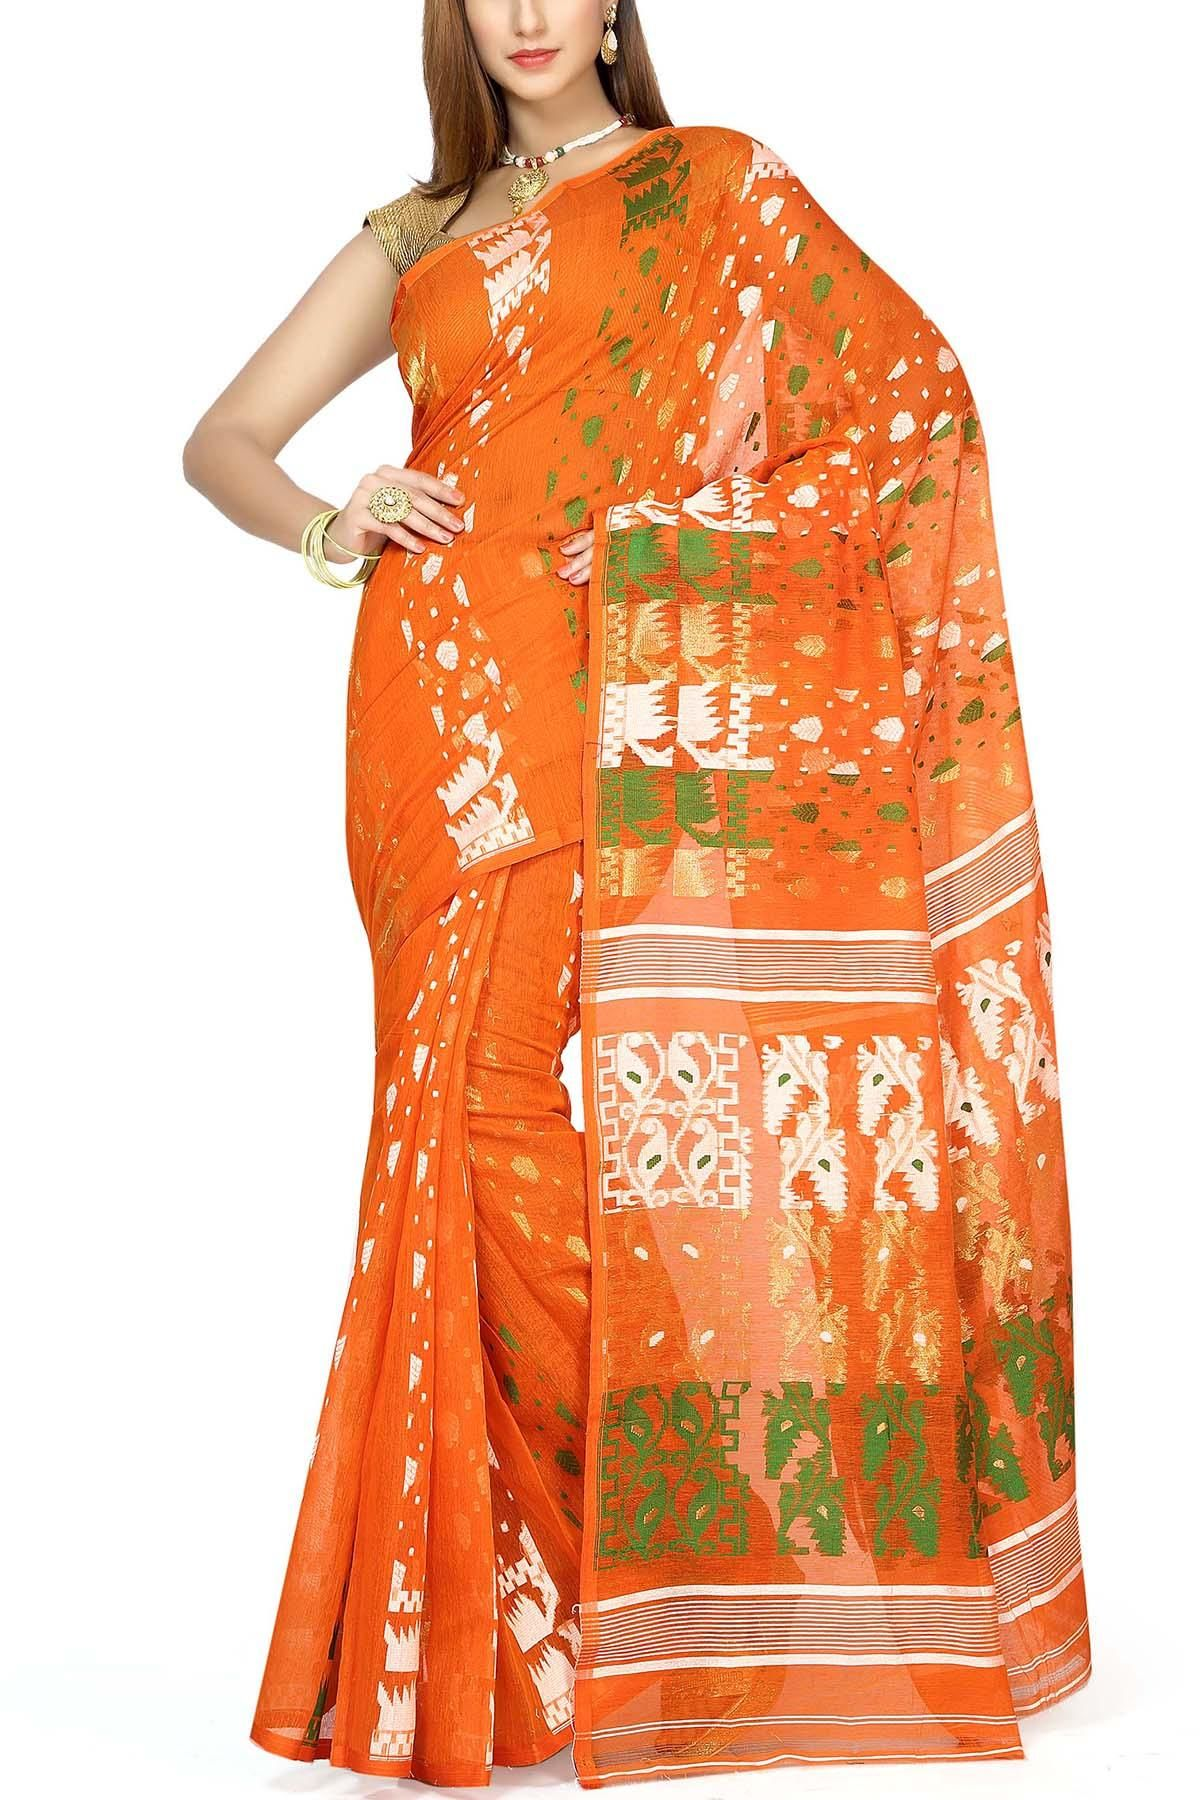 9bd44d13d3dba Giants Orange   Tri-color Dhakai Cotton Jamdani Saree